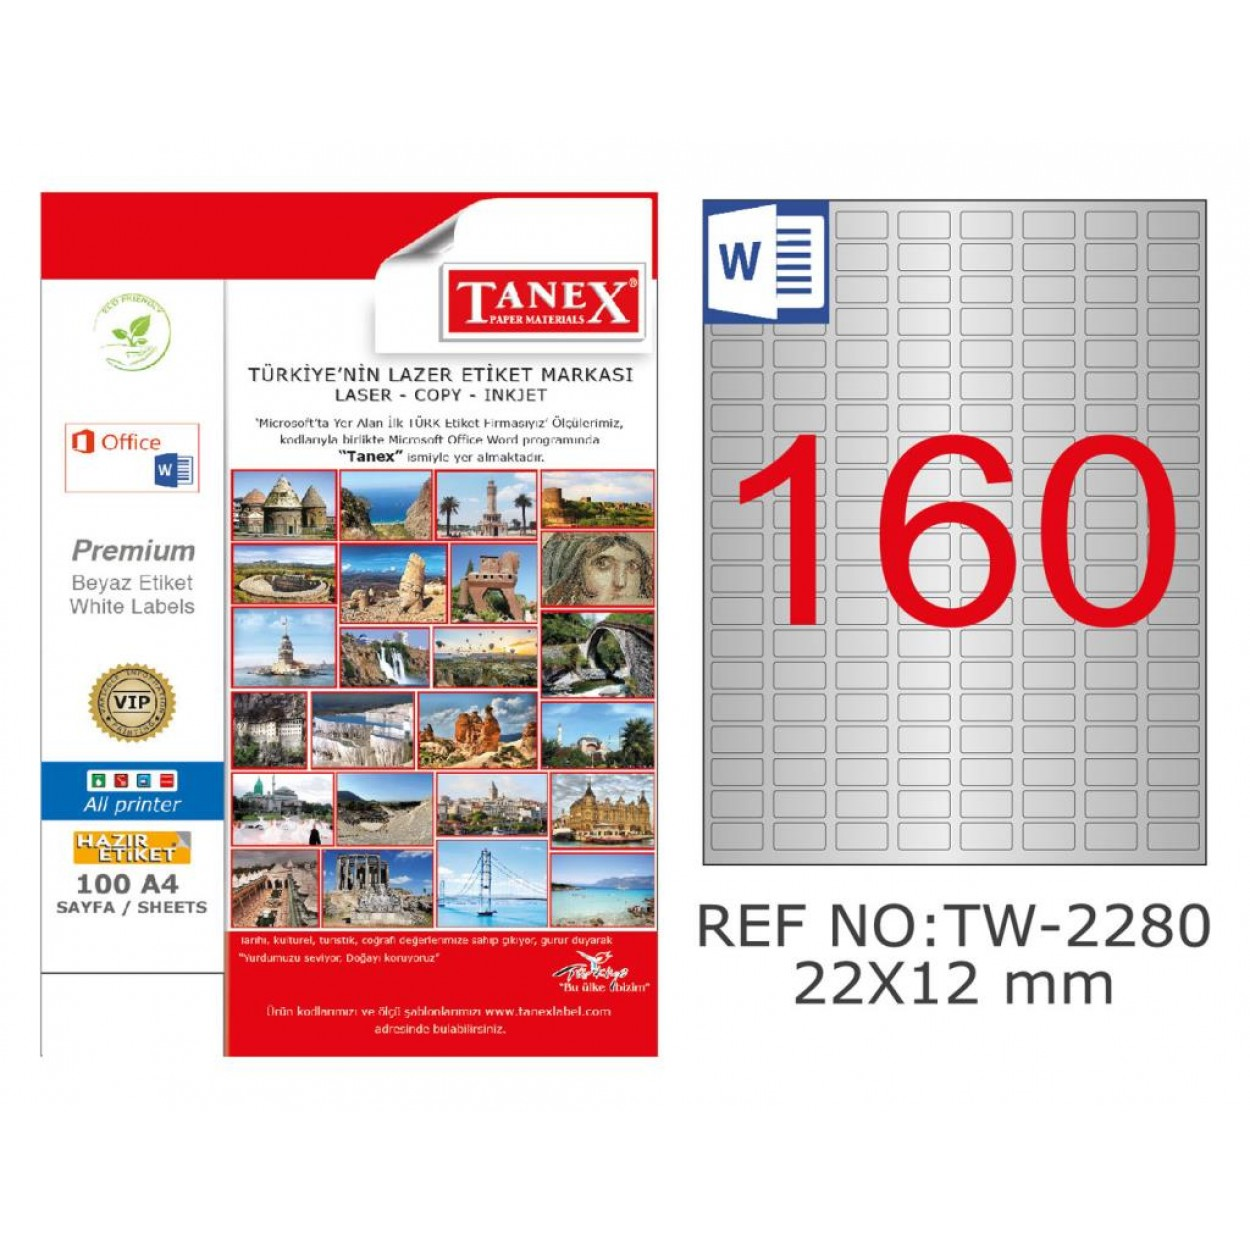 Tanex TW-2280 22x12mm Gümüş Lazer Etiket 4000 Li